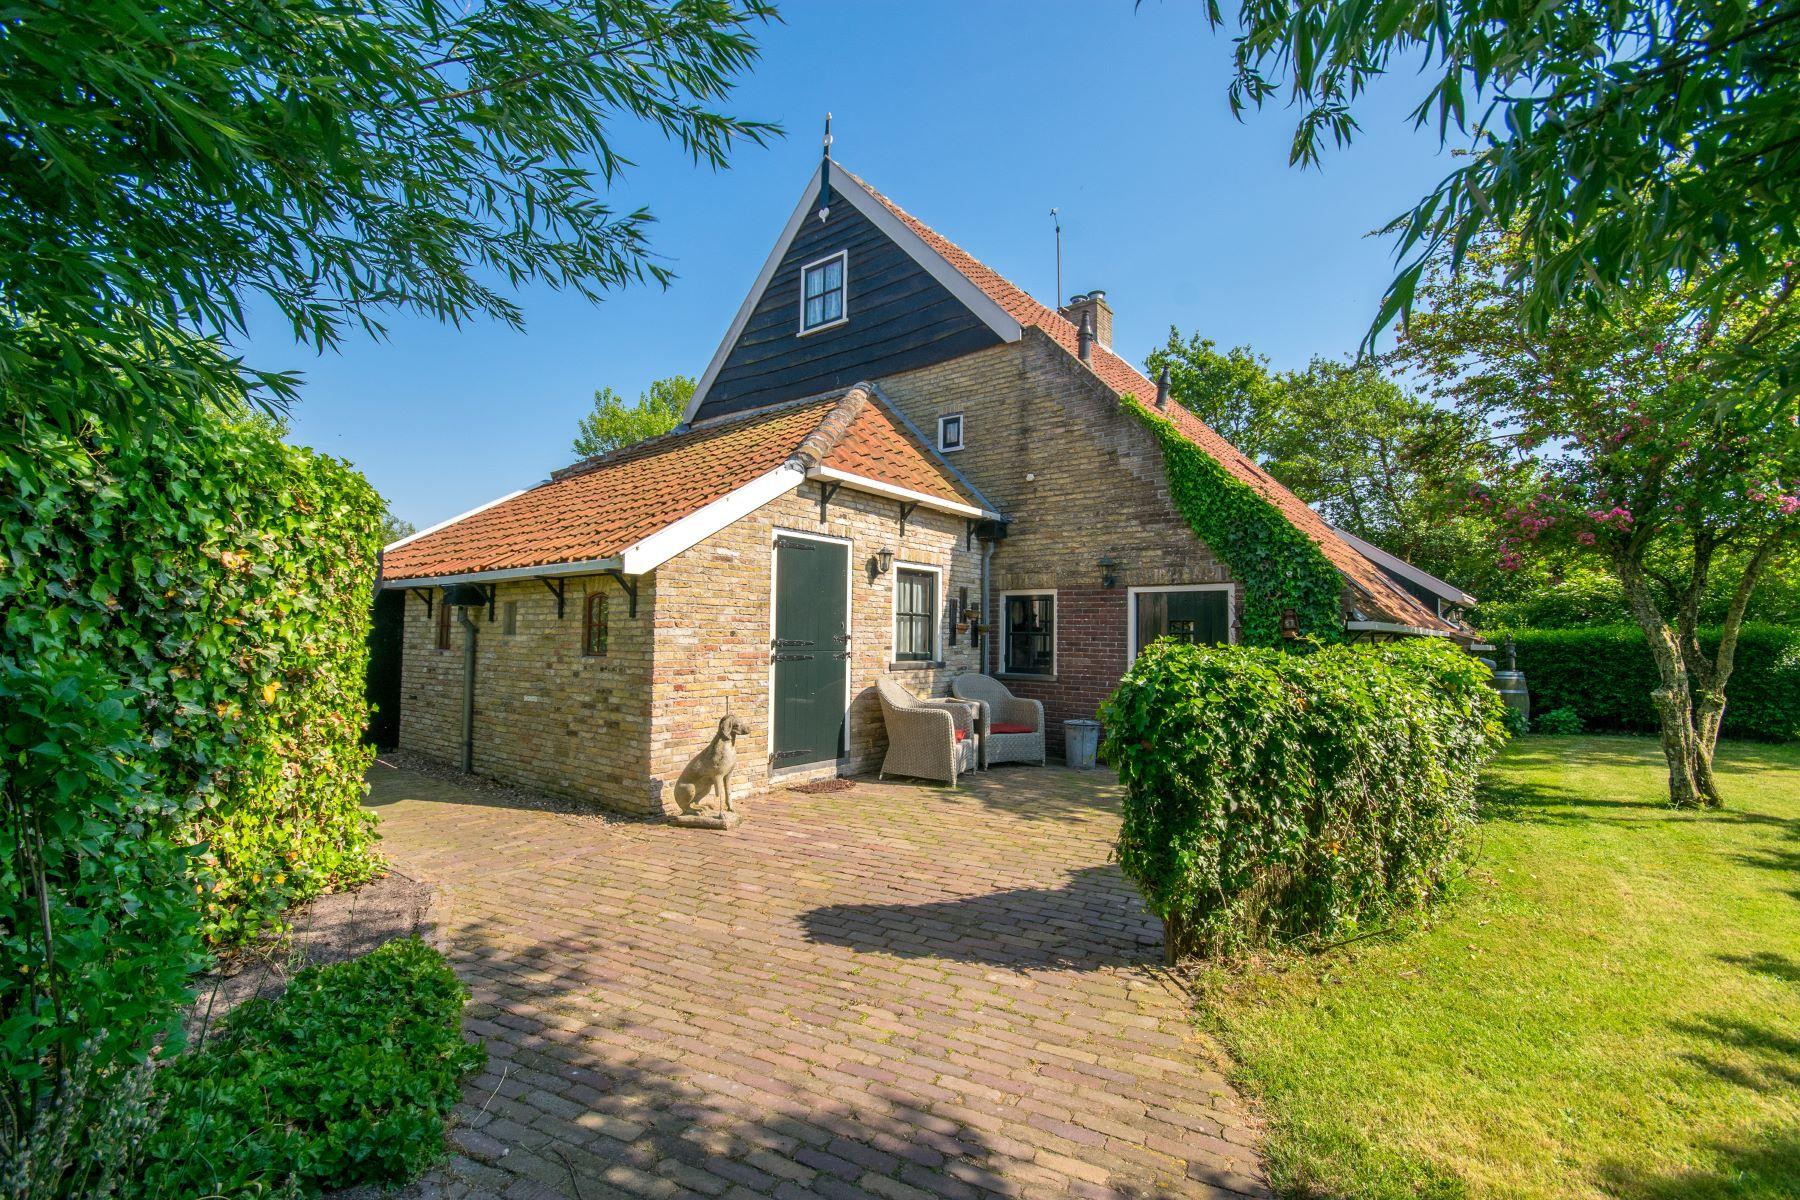 Single Family Homes for Sale at Royal farmhouse Kooiweg 1 Hoorn, Friesland 8896 JL Netherlands